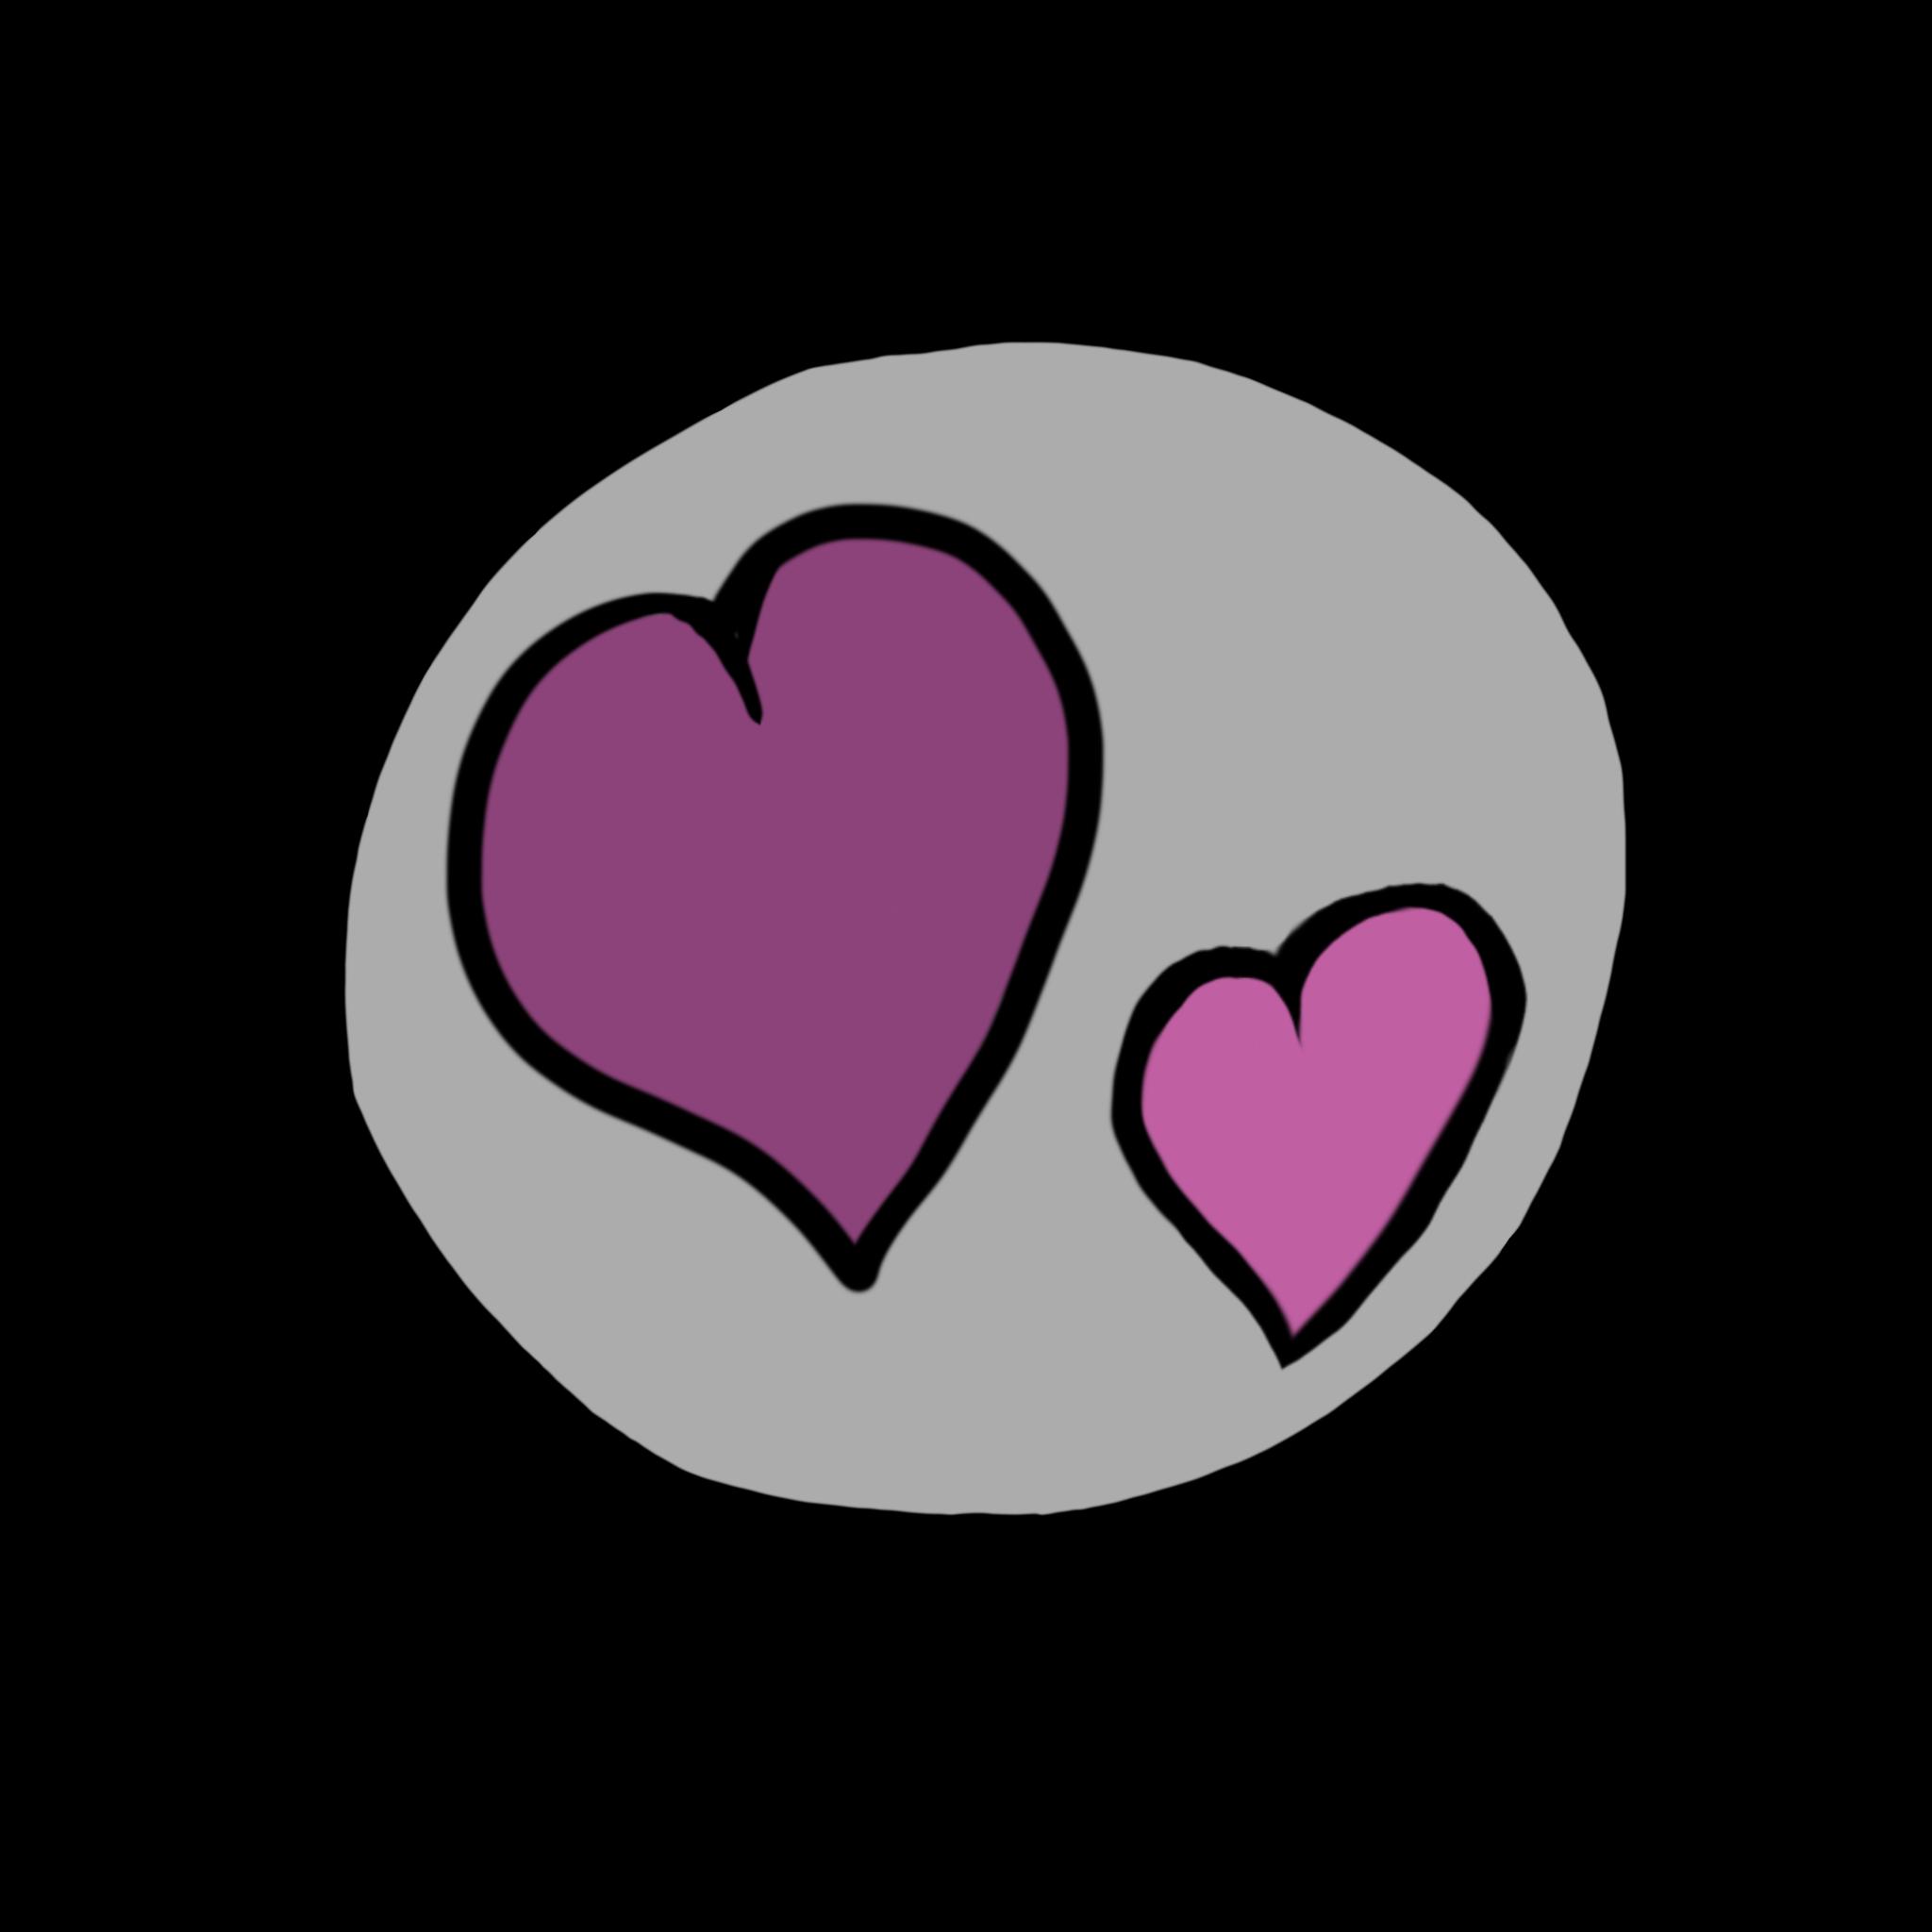 heart logo.png